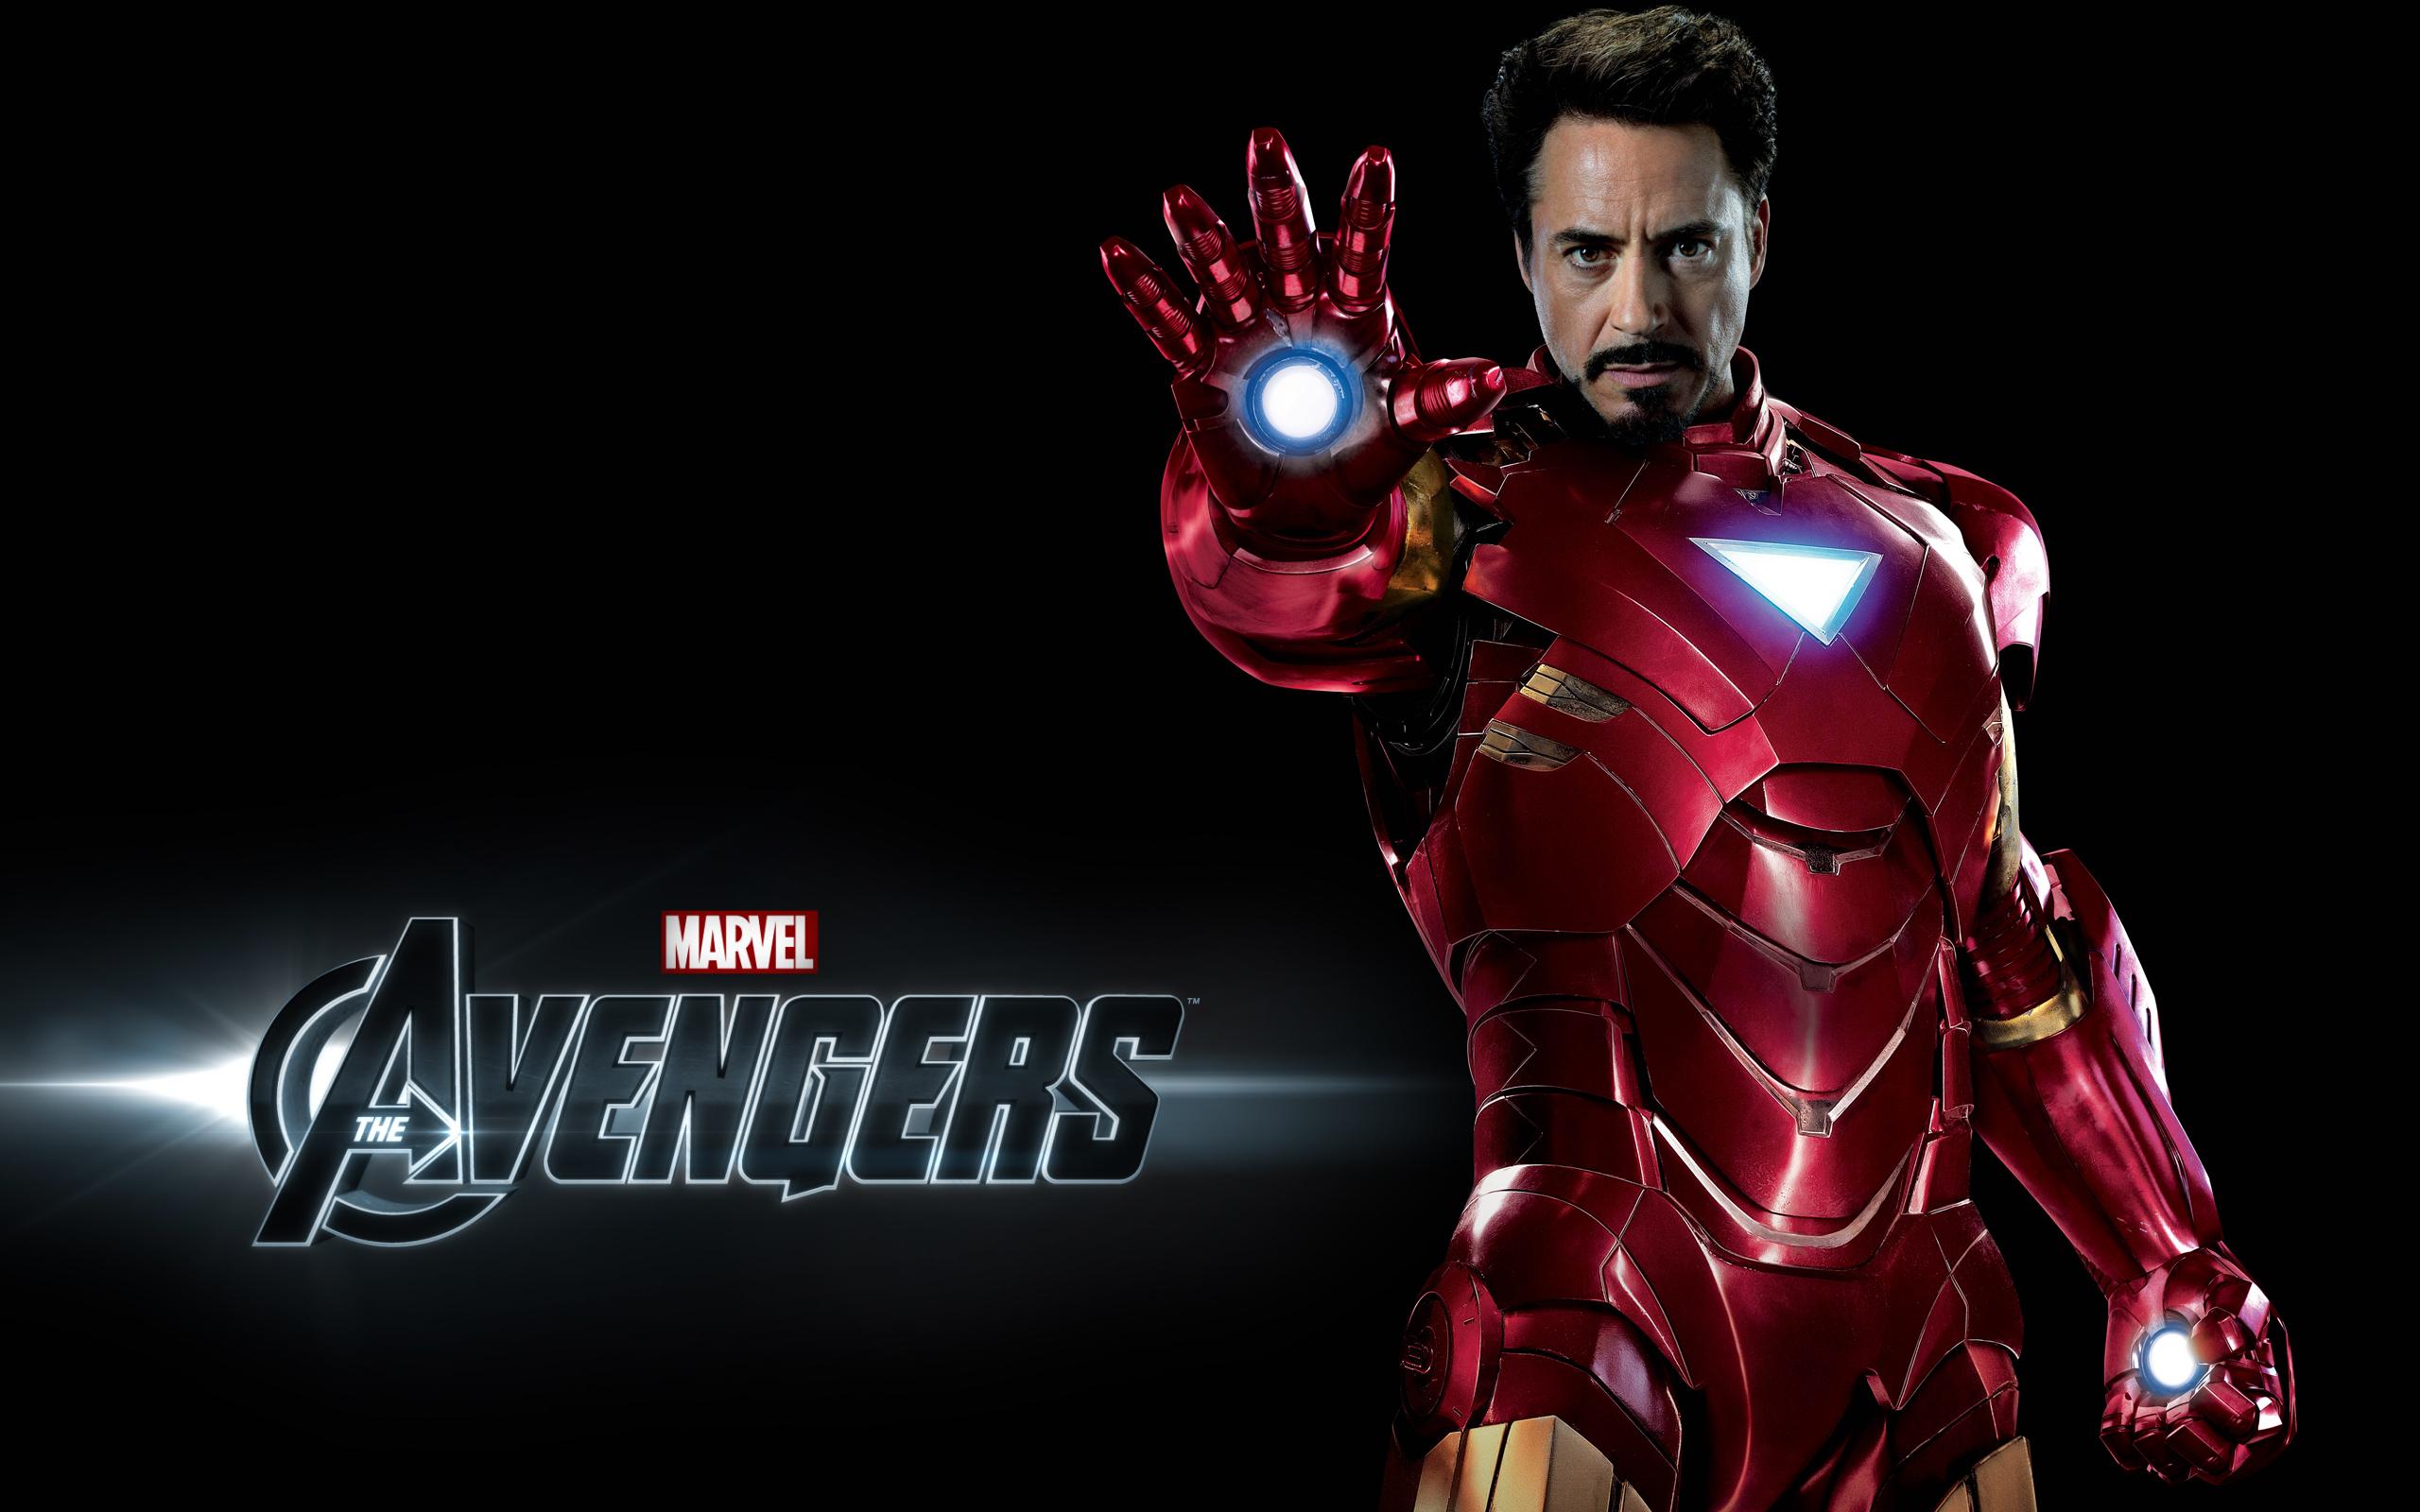 Железный человек Avengers  № 1390451 бесплатно